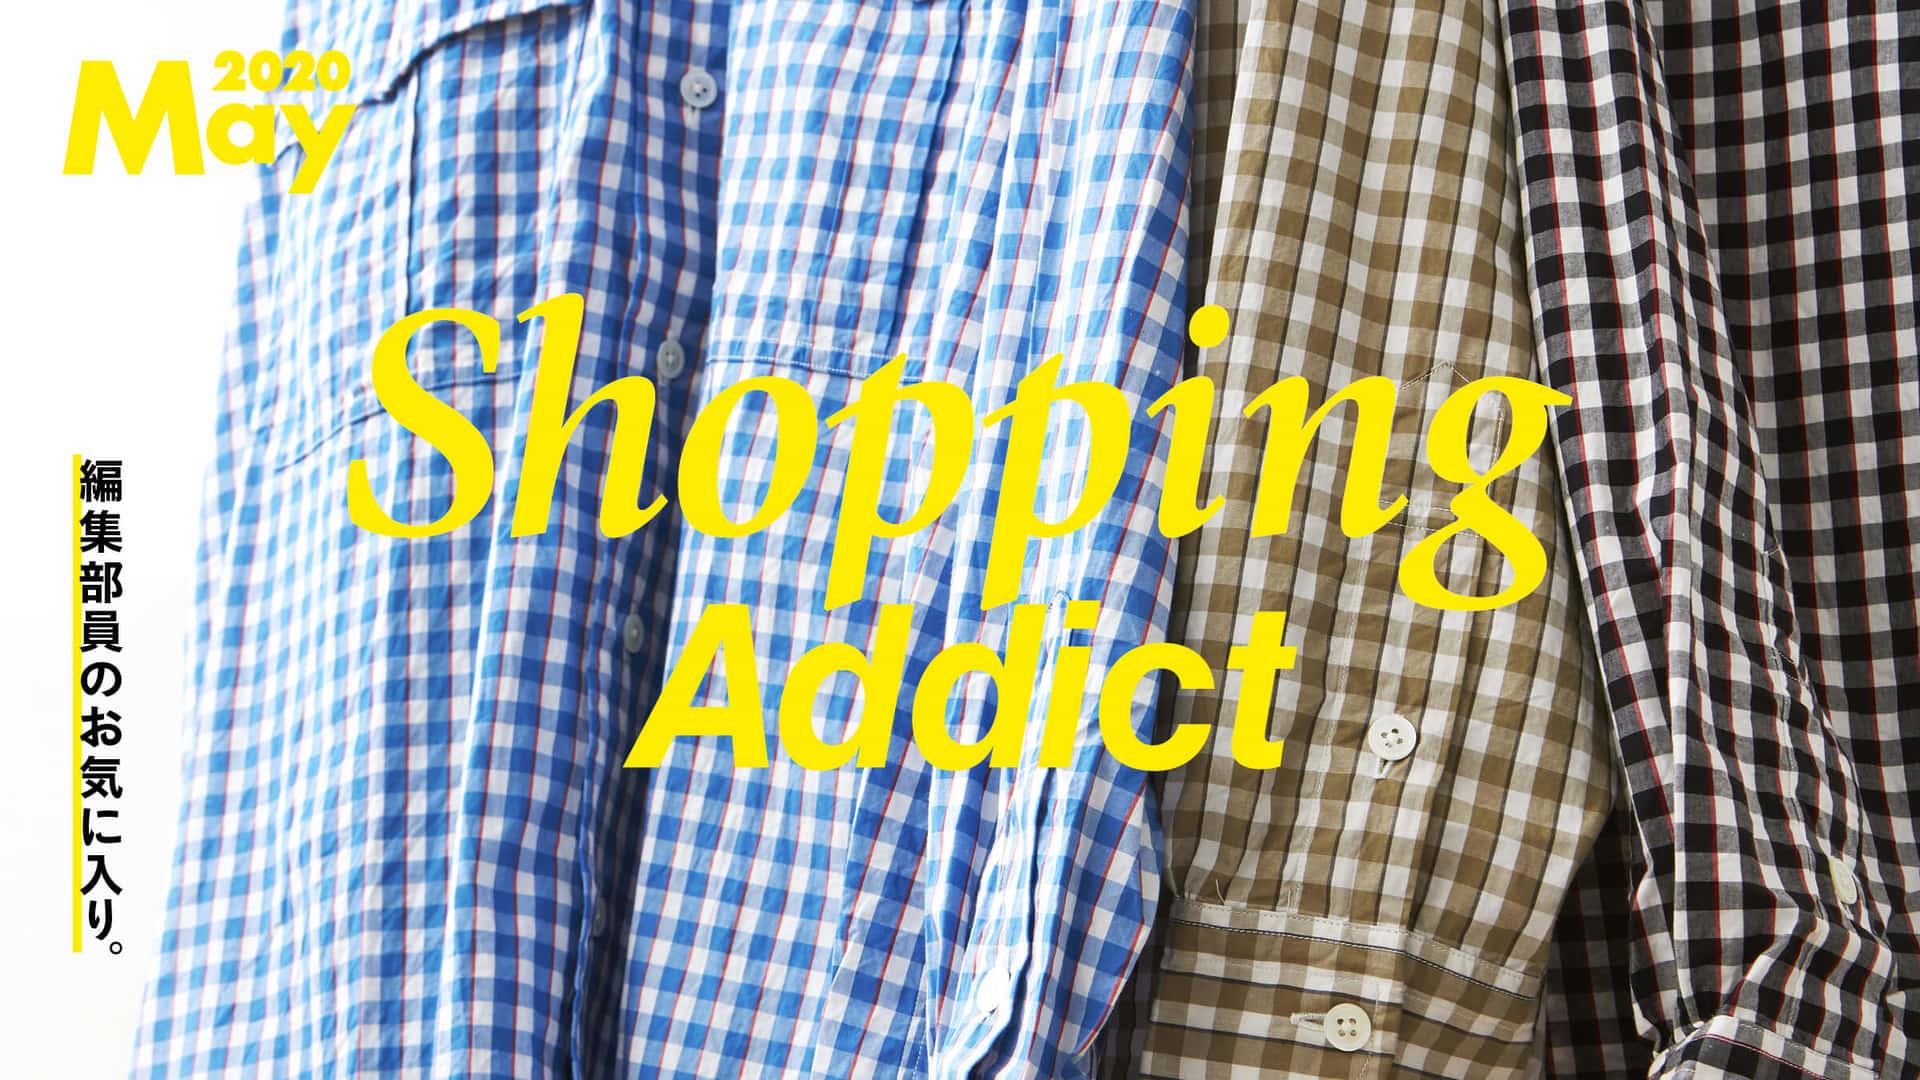 Shopping Addict 2020 May 〜編集部員のお気に入り〜